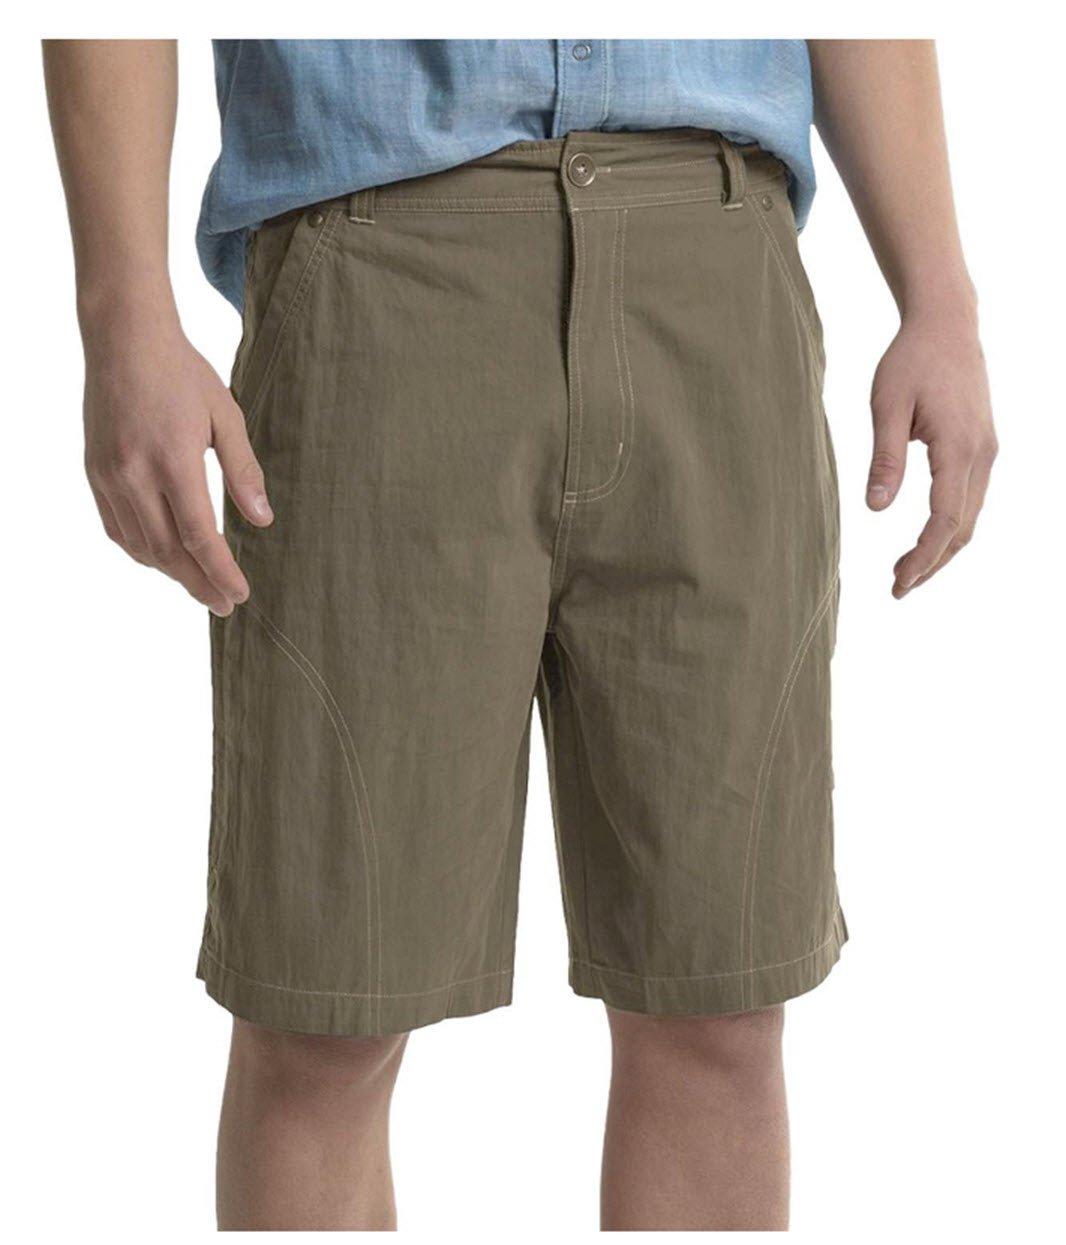 Pacific Trail Men's Cotton-Nylon Shorts, Sand, Size 42